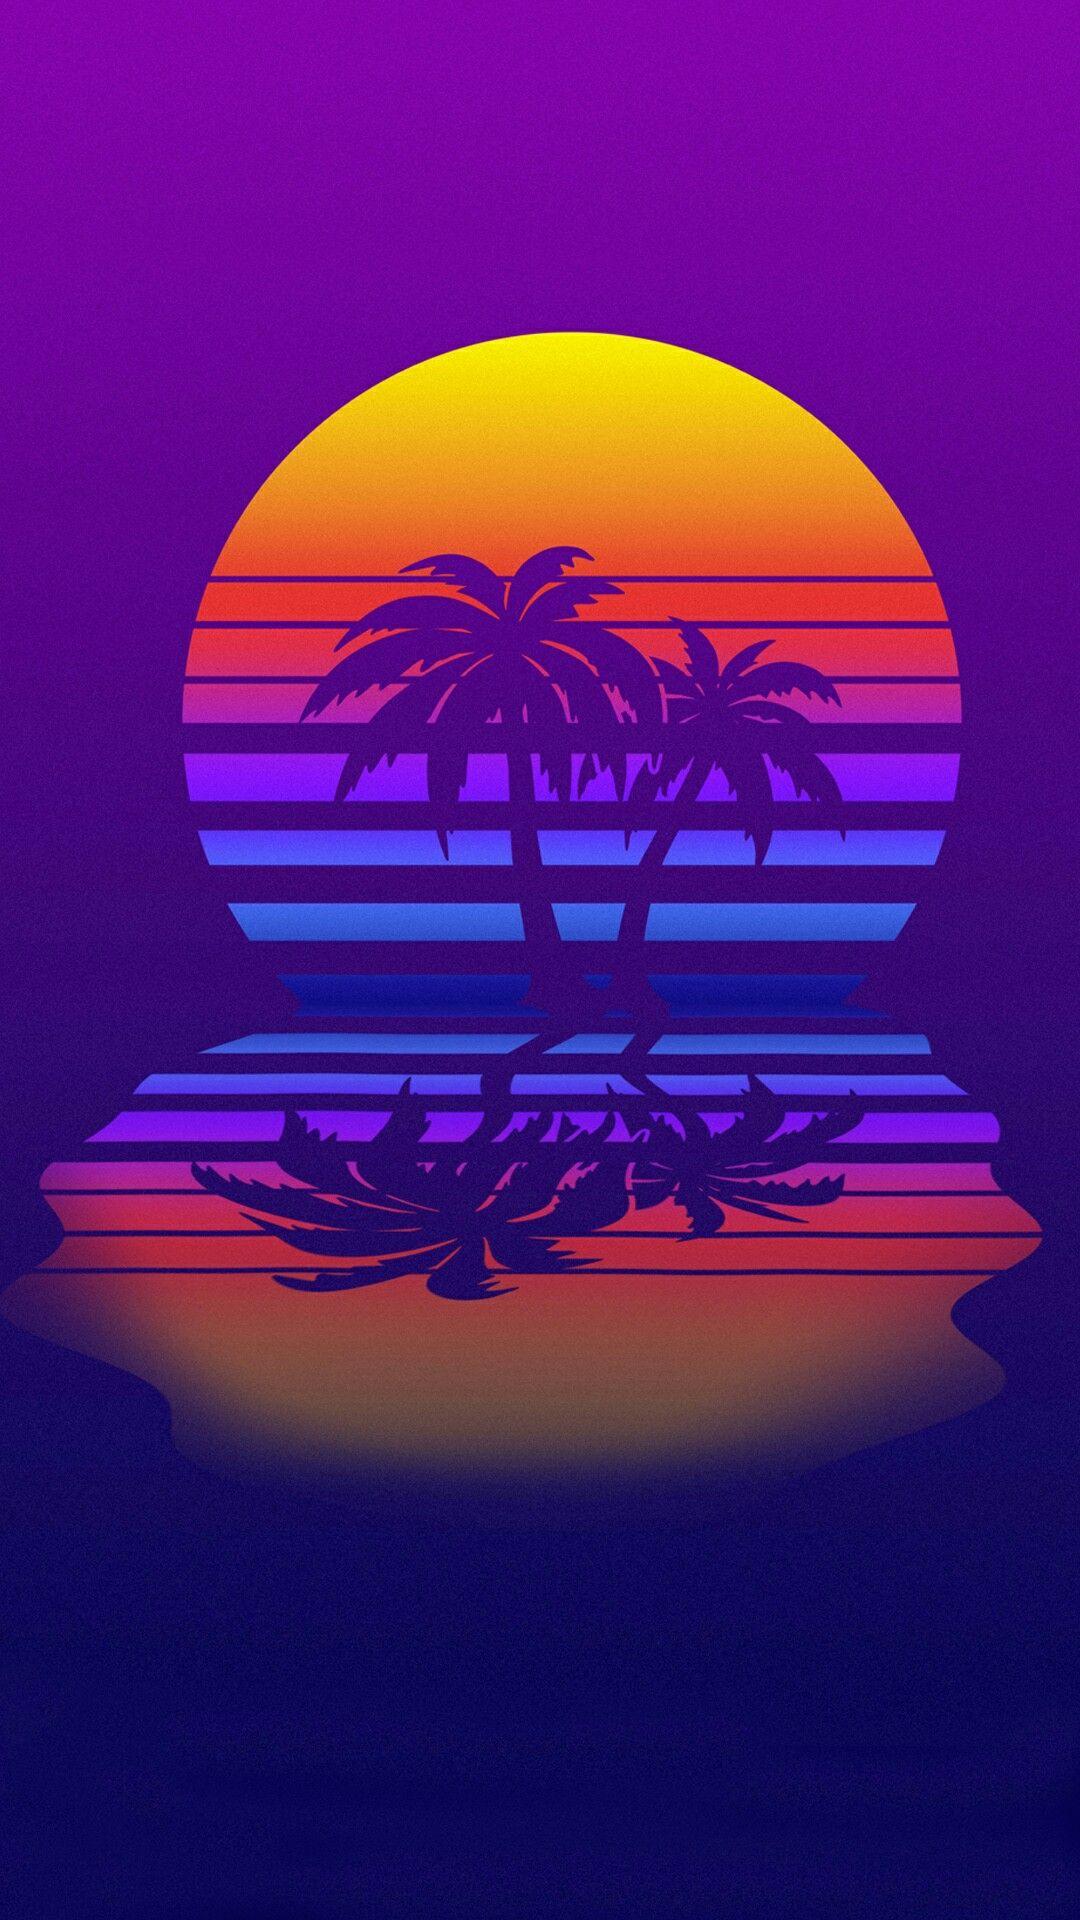 retrowave Vaporwave wallpaper, Palm trees wallpaper